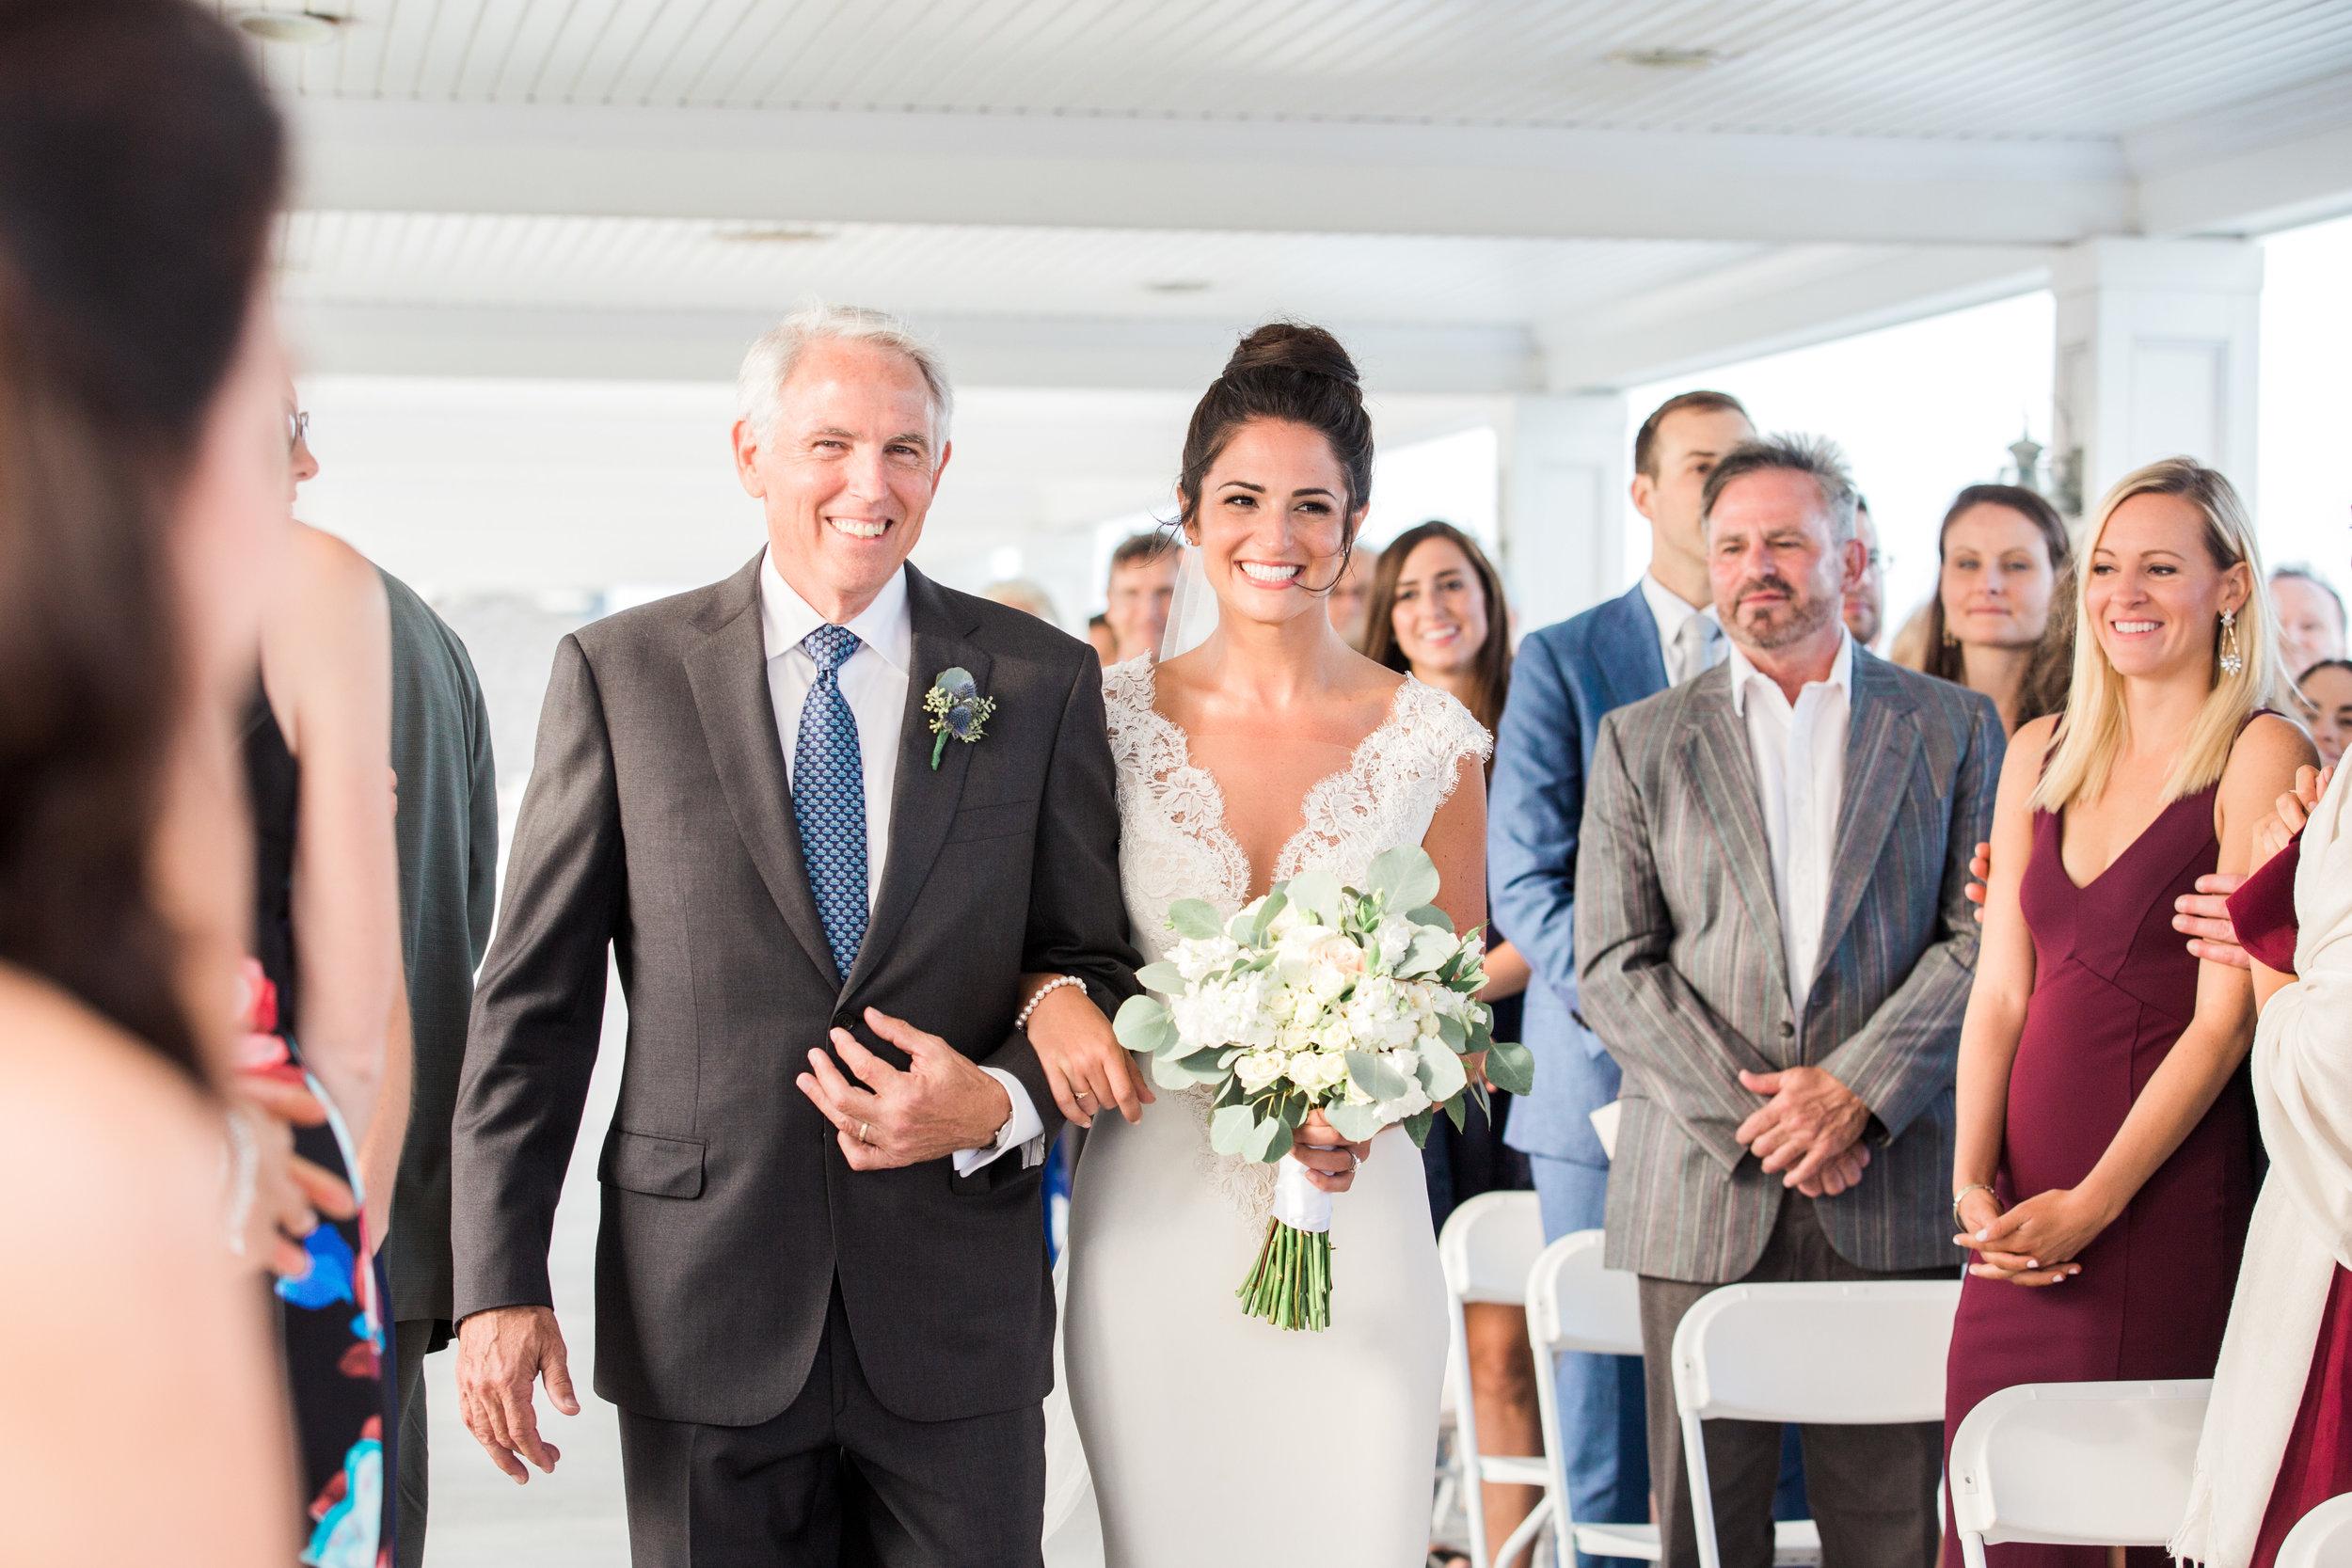 Spring-Lake-New-Jersey-Beach-Wedding-Photographer_251.jpg